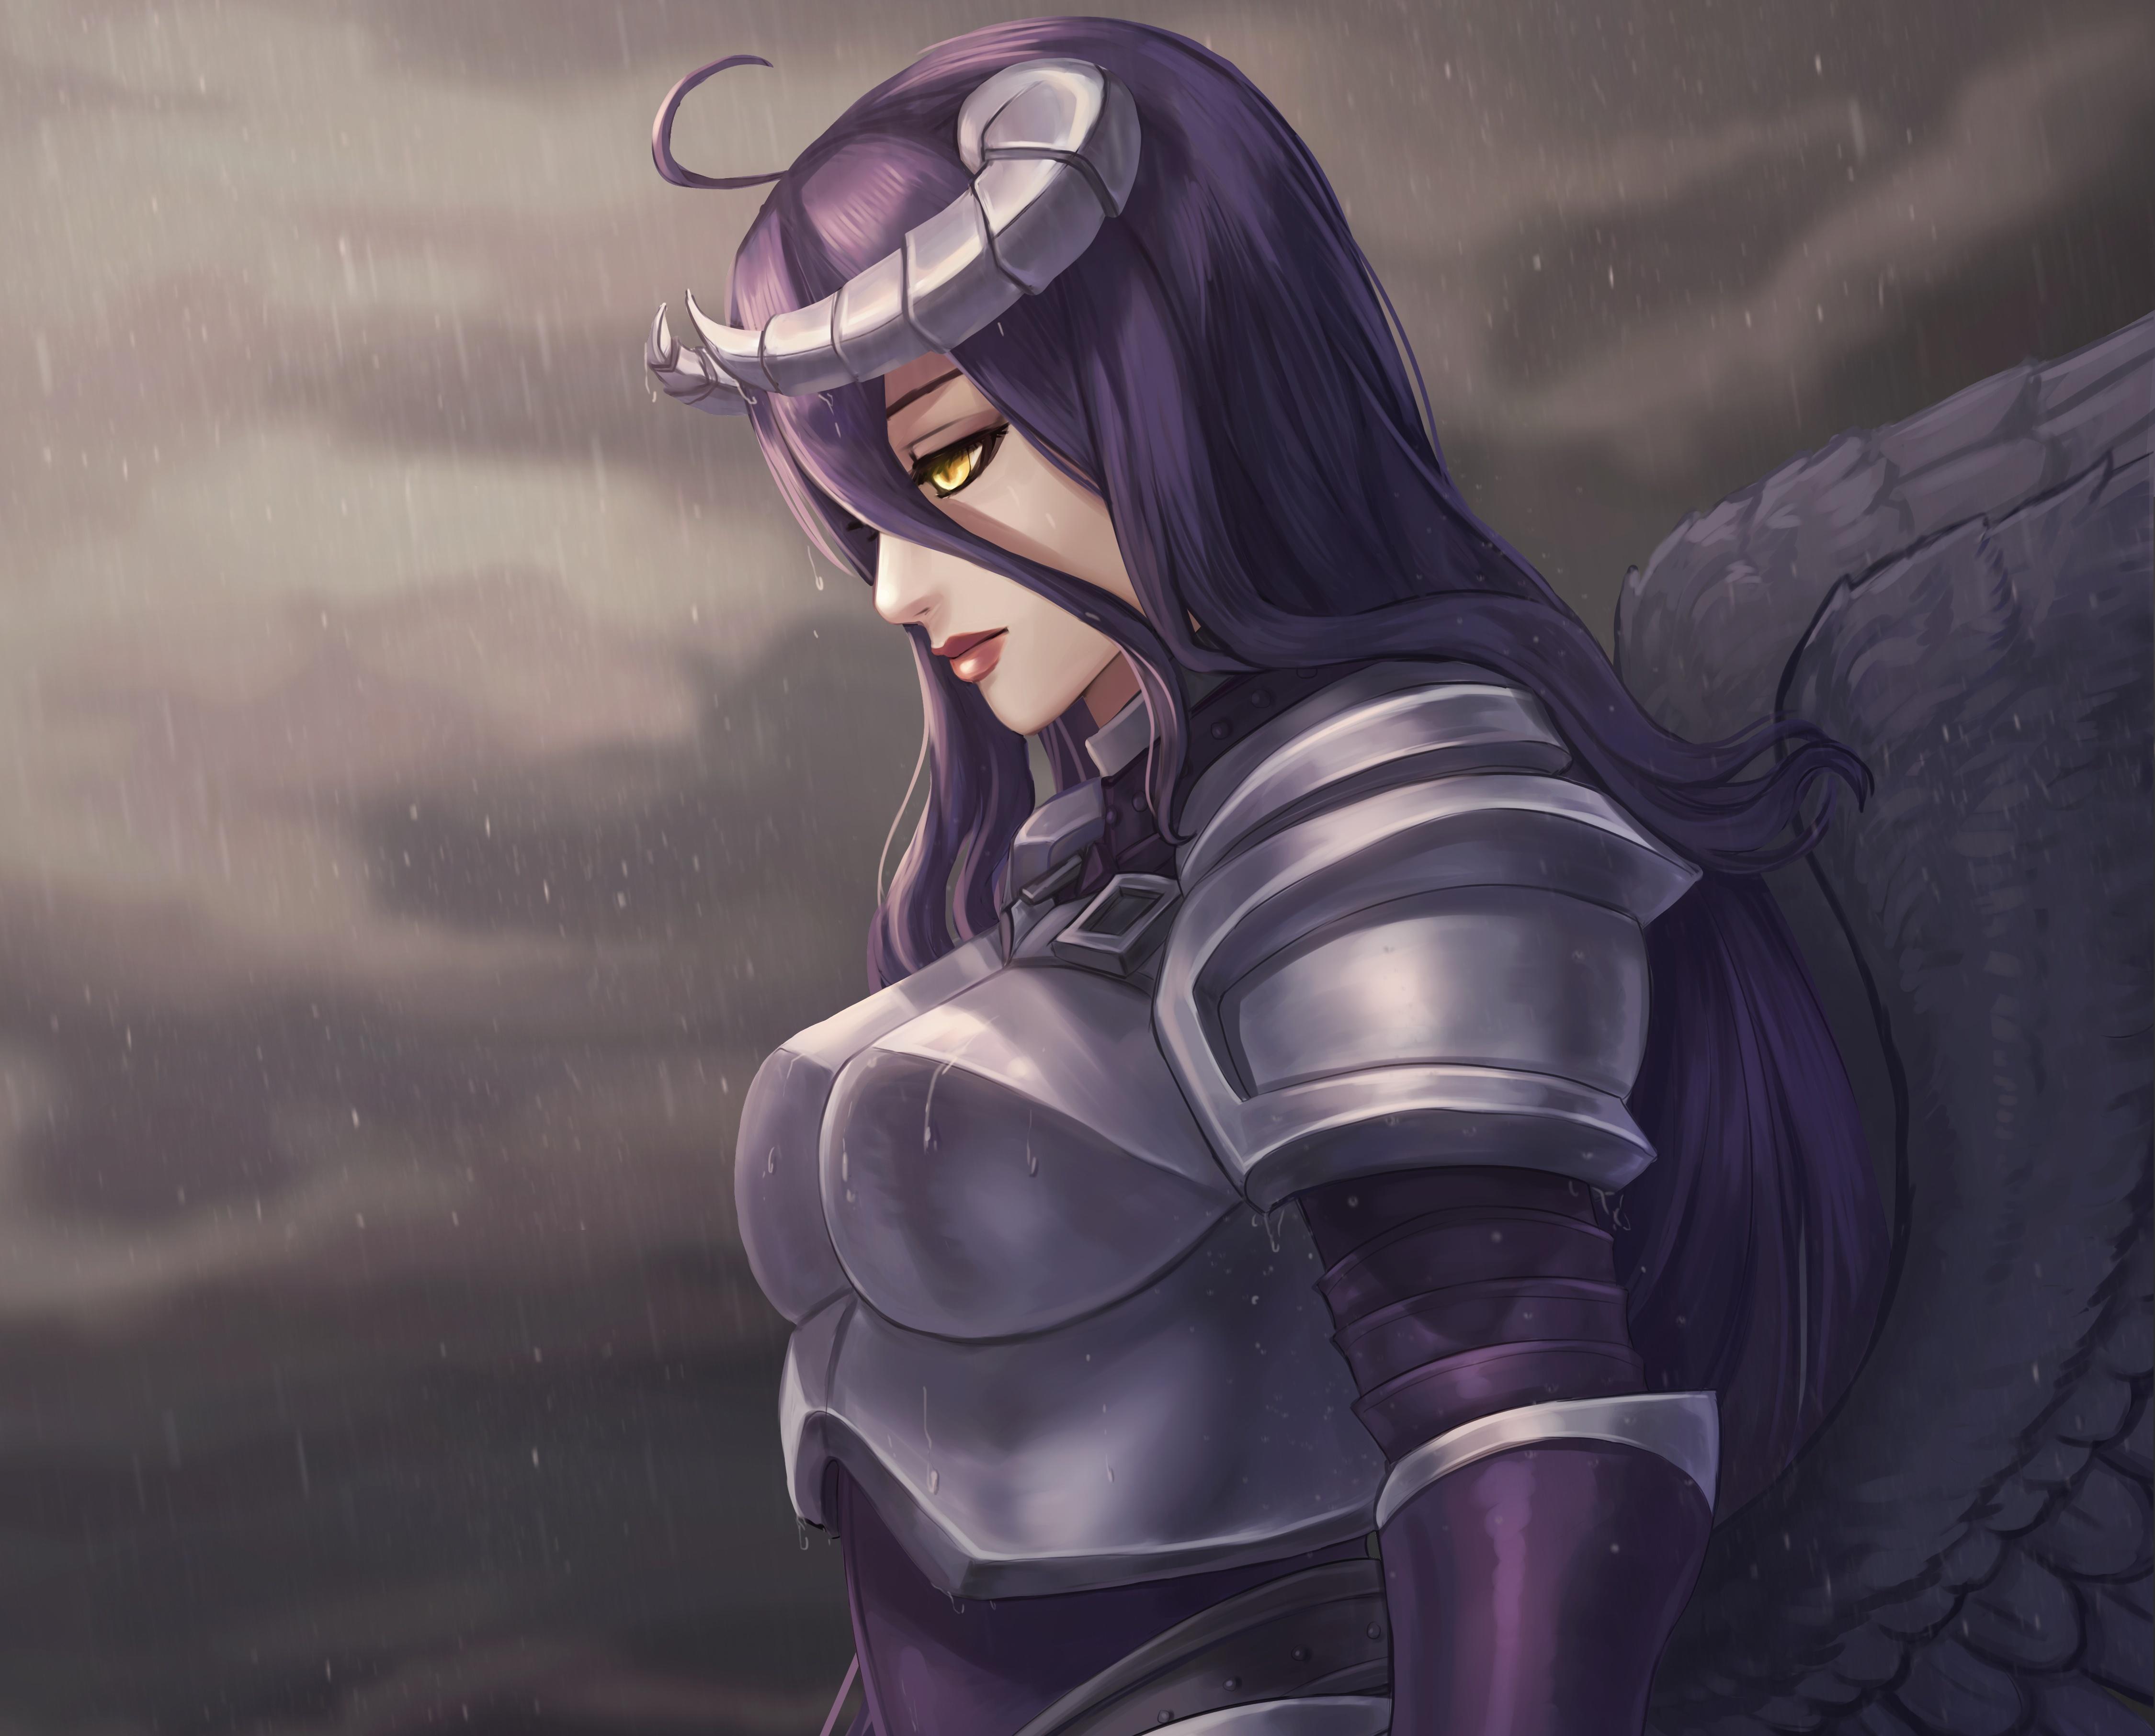 Wallpaper Overlord Armor Warriors Armored Albedo Girls 4500x3626